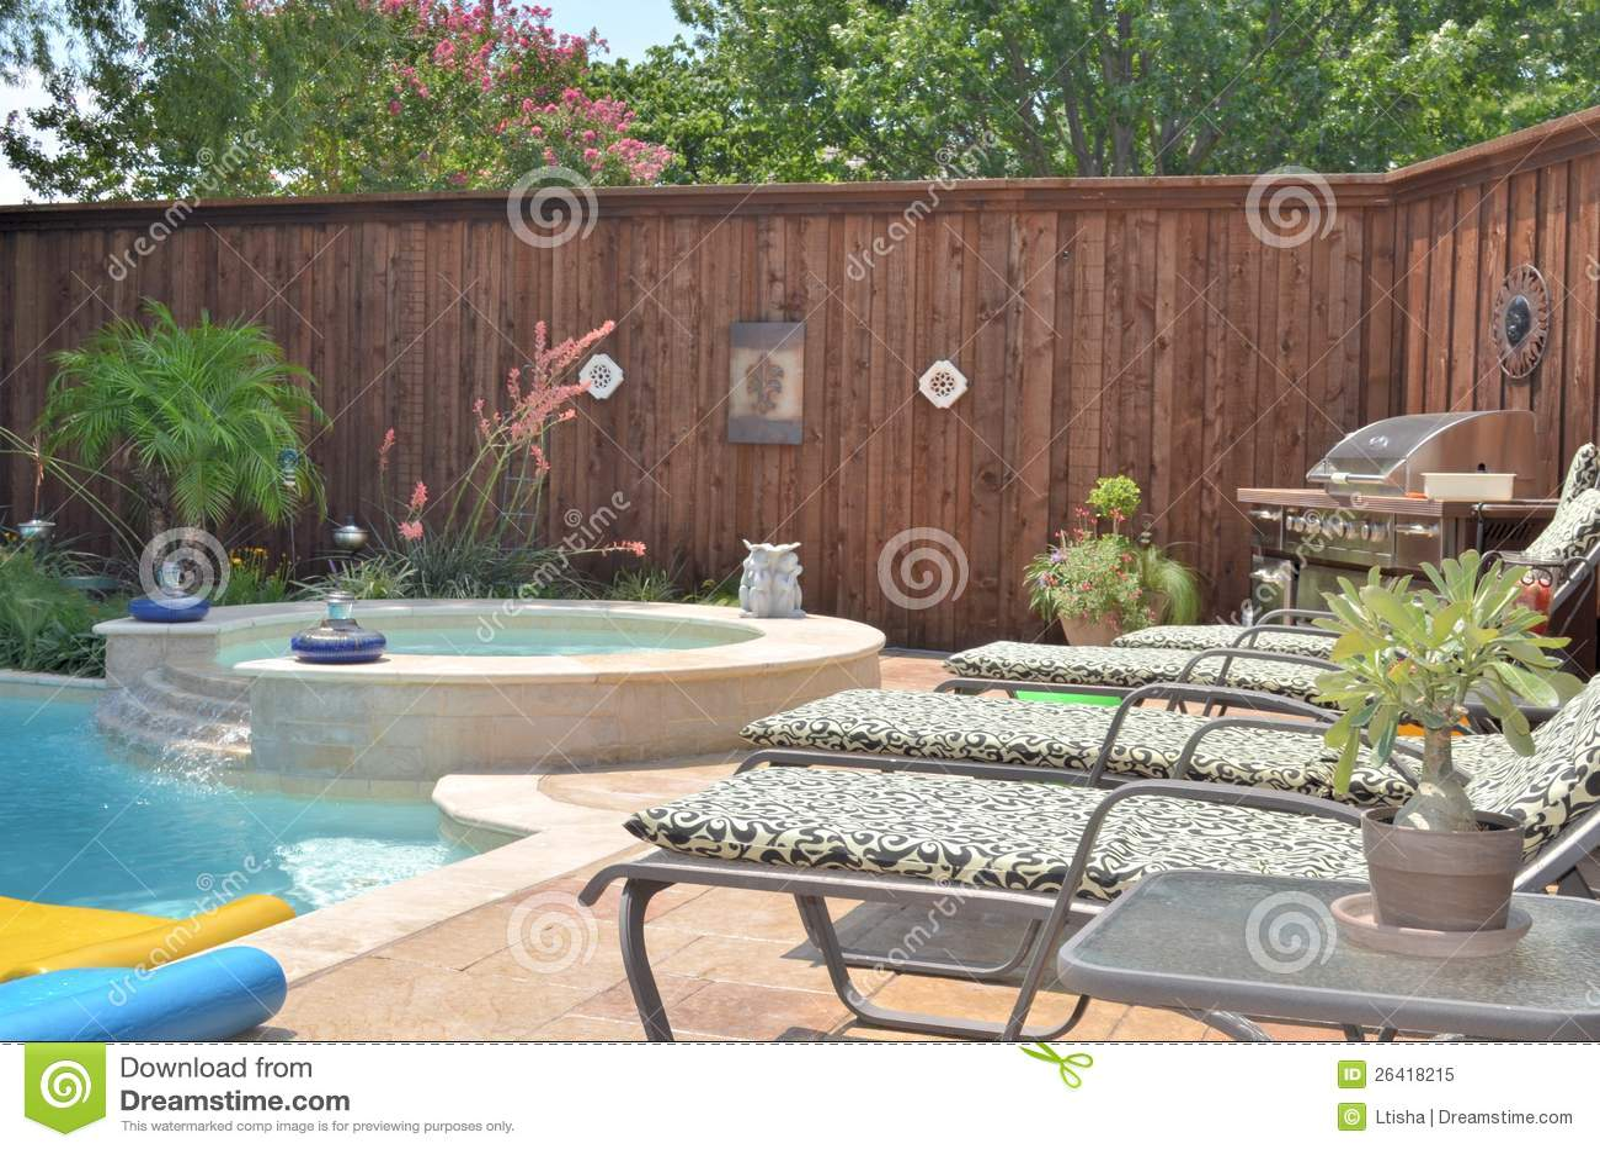 backyard grill royalty free stock photo image 26418215